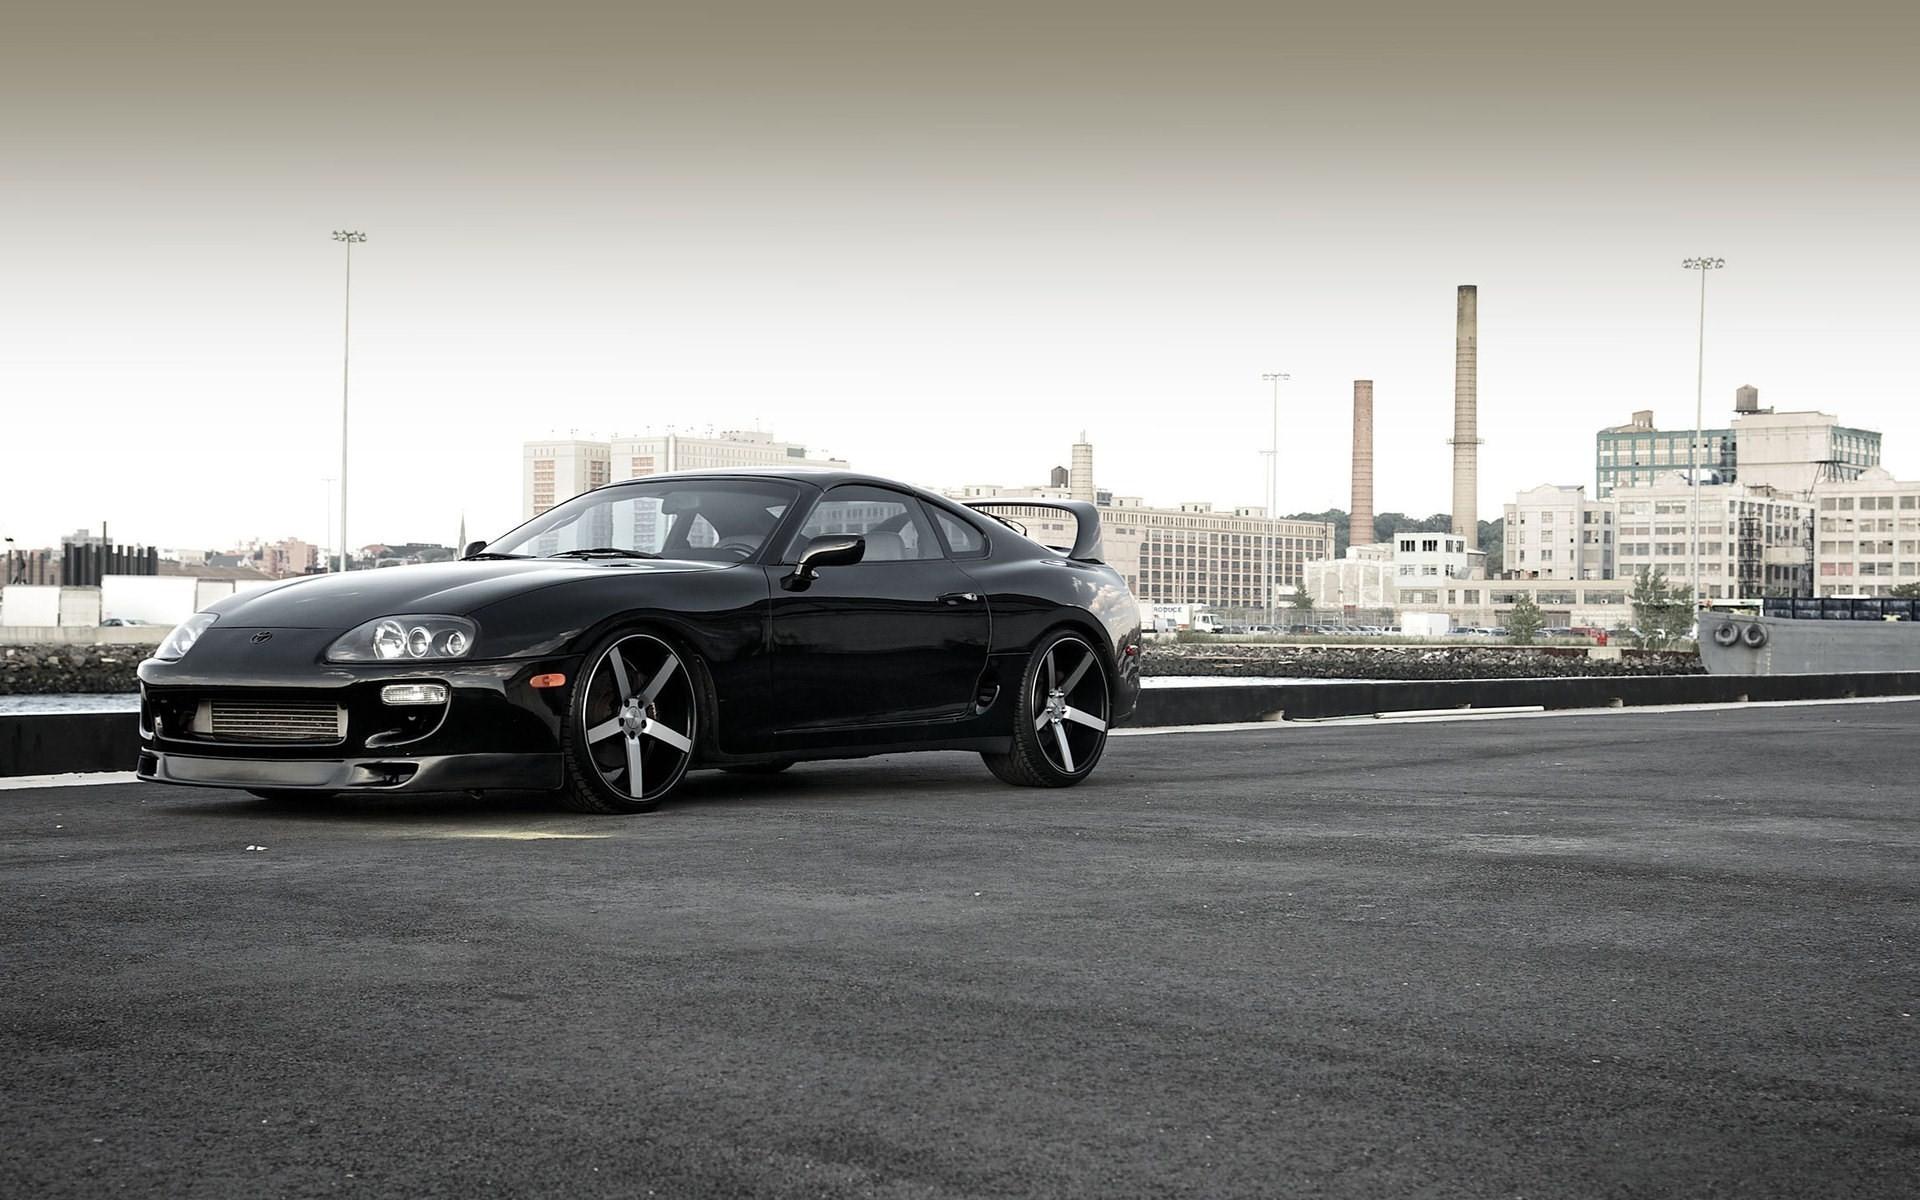 White Supra Wallpaper Images #XVH | Cars | Pinterest | White supra and Cars